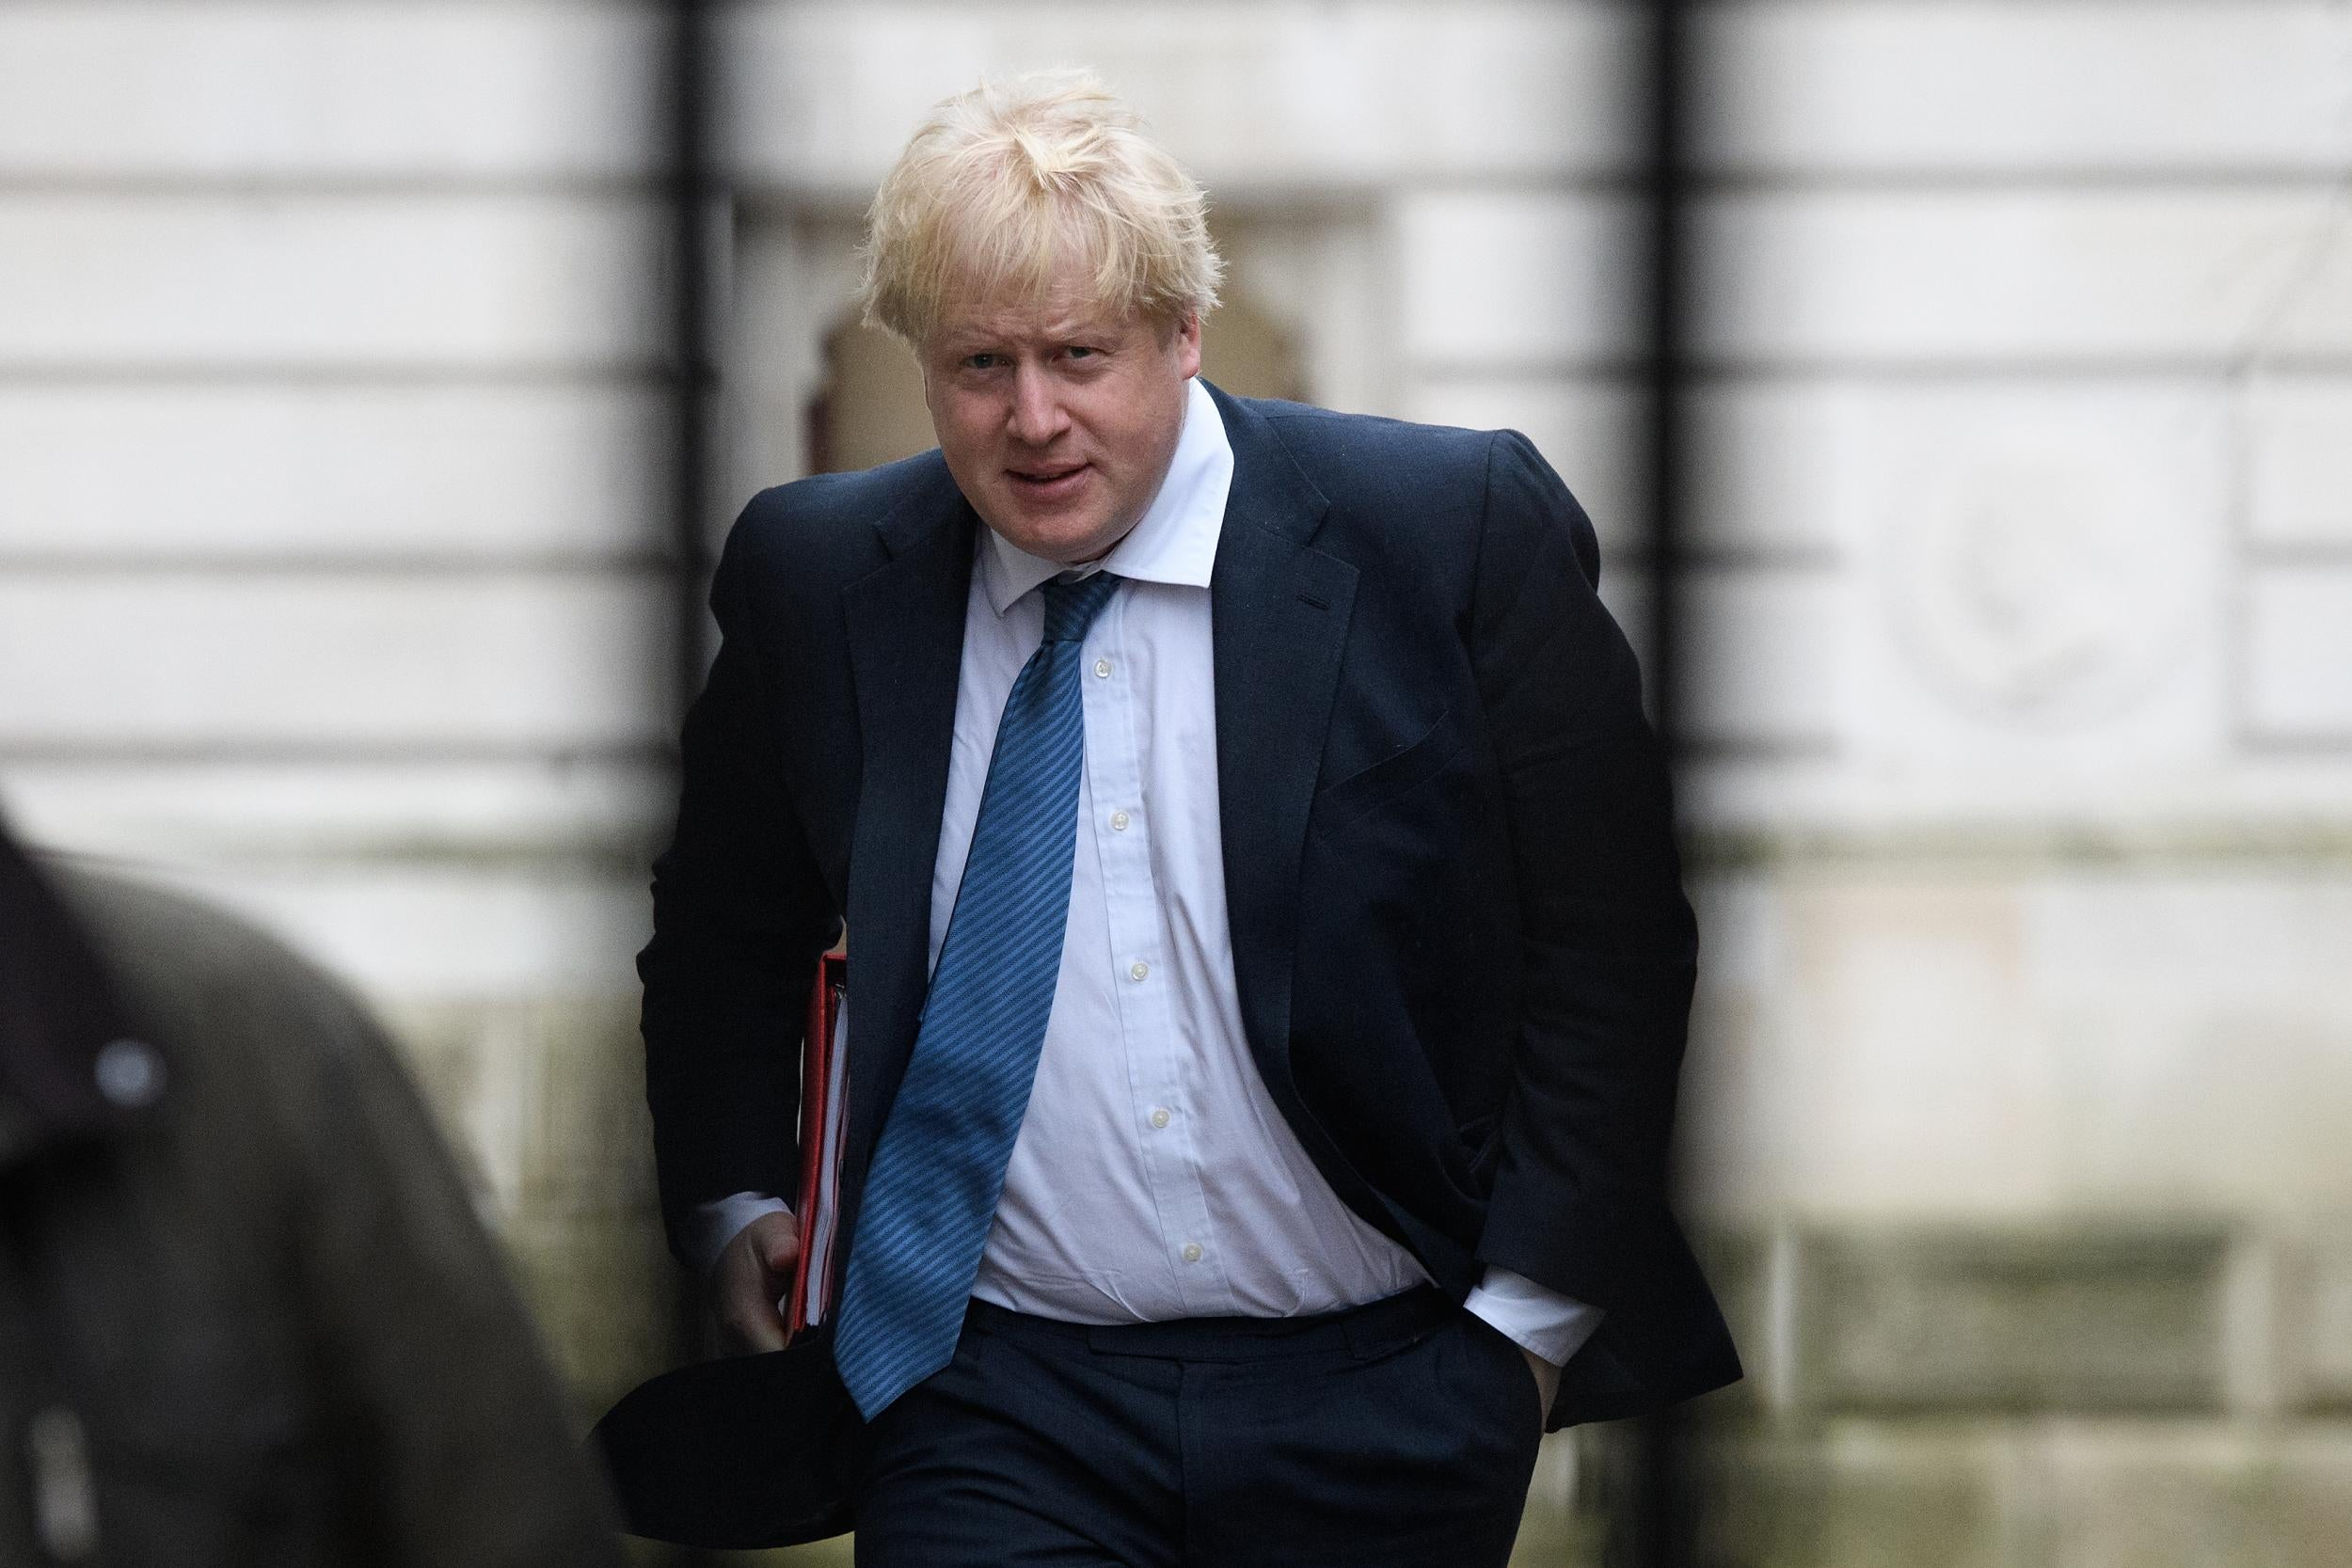 Brexit: Boris Johnson's hard line on immigrants risks 'retaliatory deportations' for UK citizens in Europe